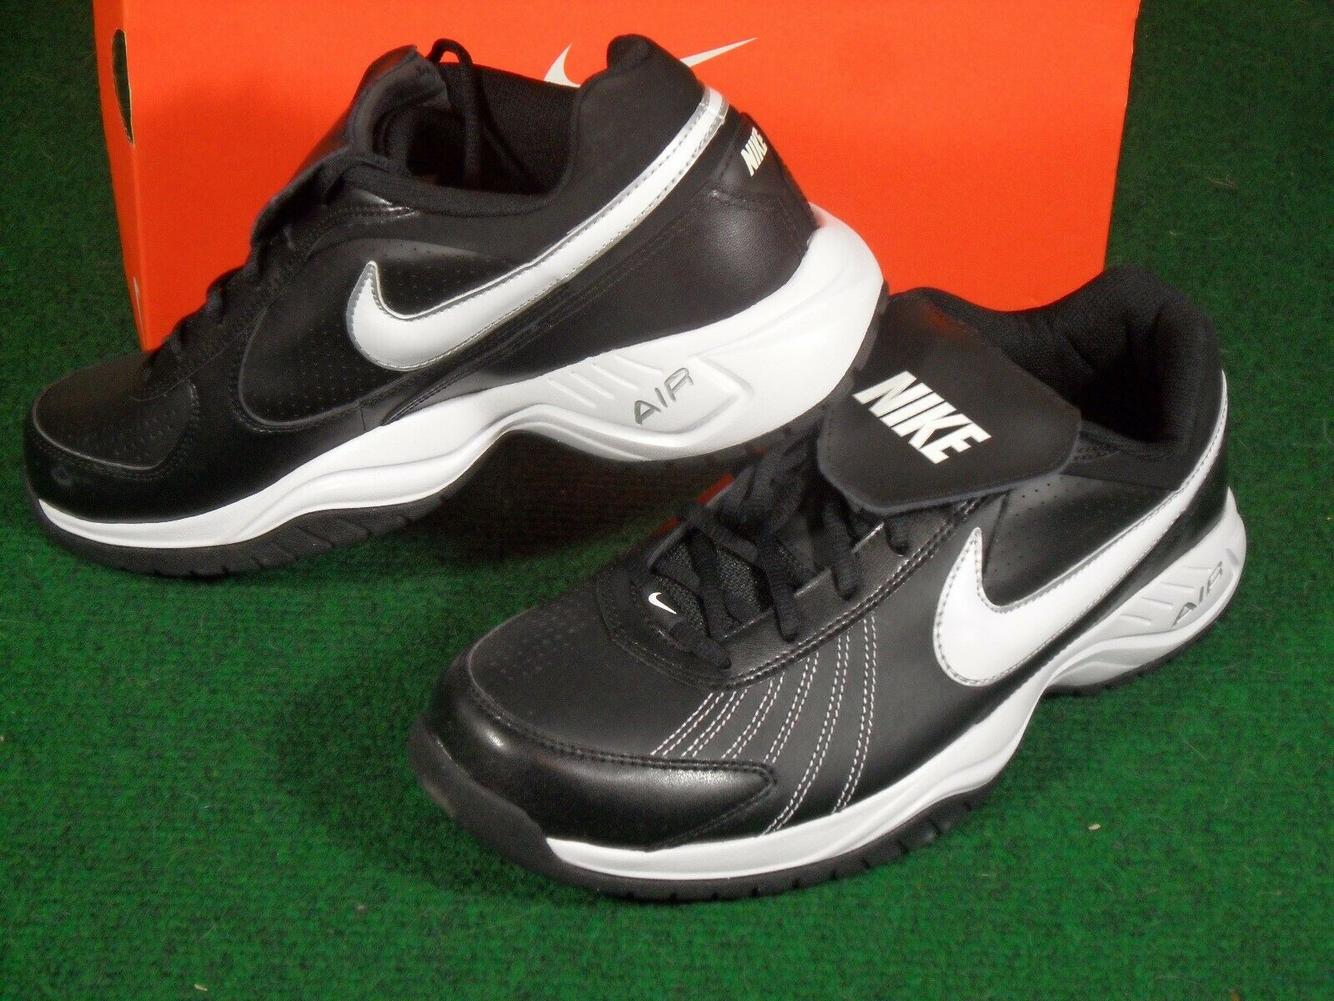 Mens Nike Air Diamond Trainer Turf Low Baseball Cleats Shoes